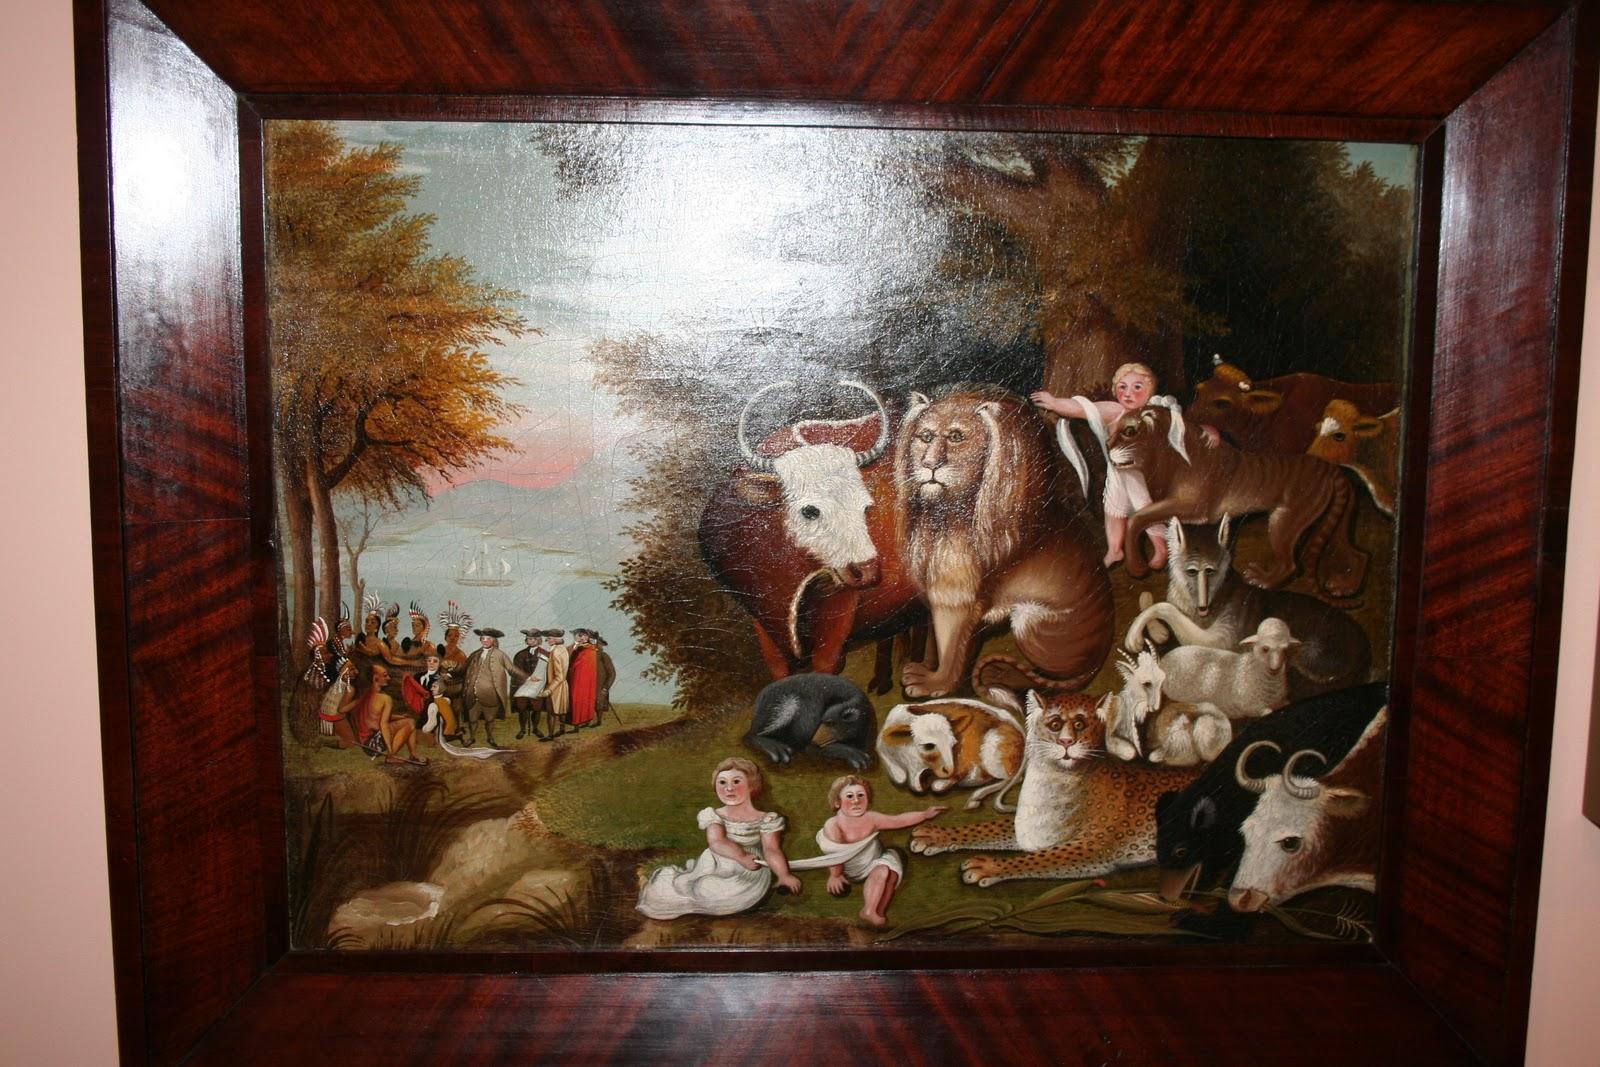 Rockefeller's Art Collection